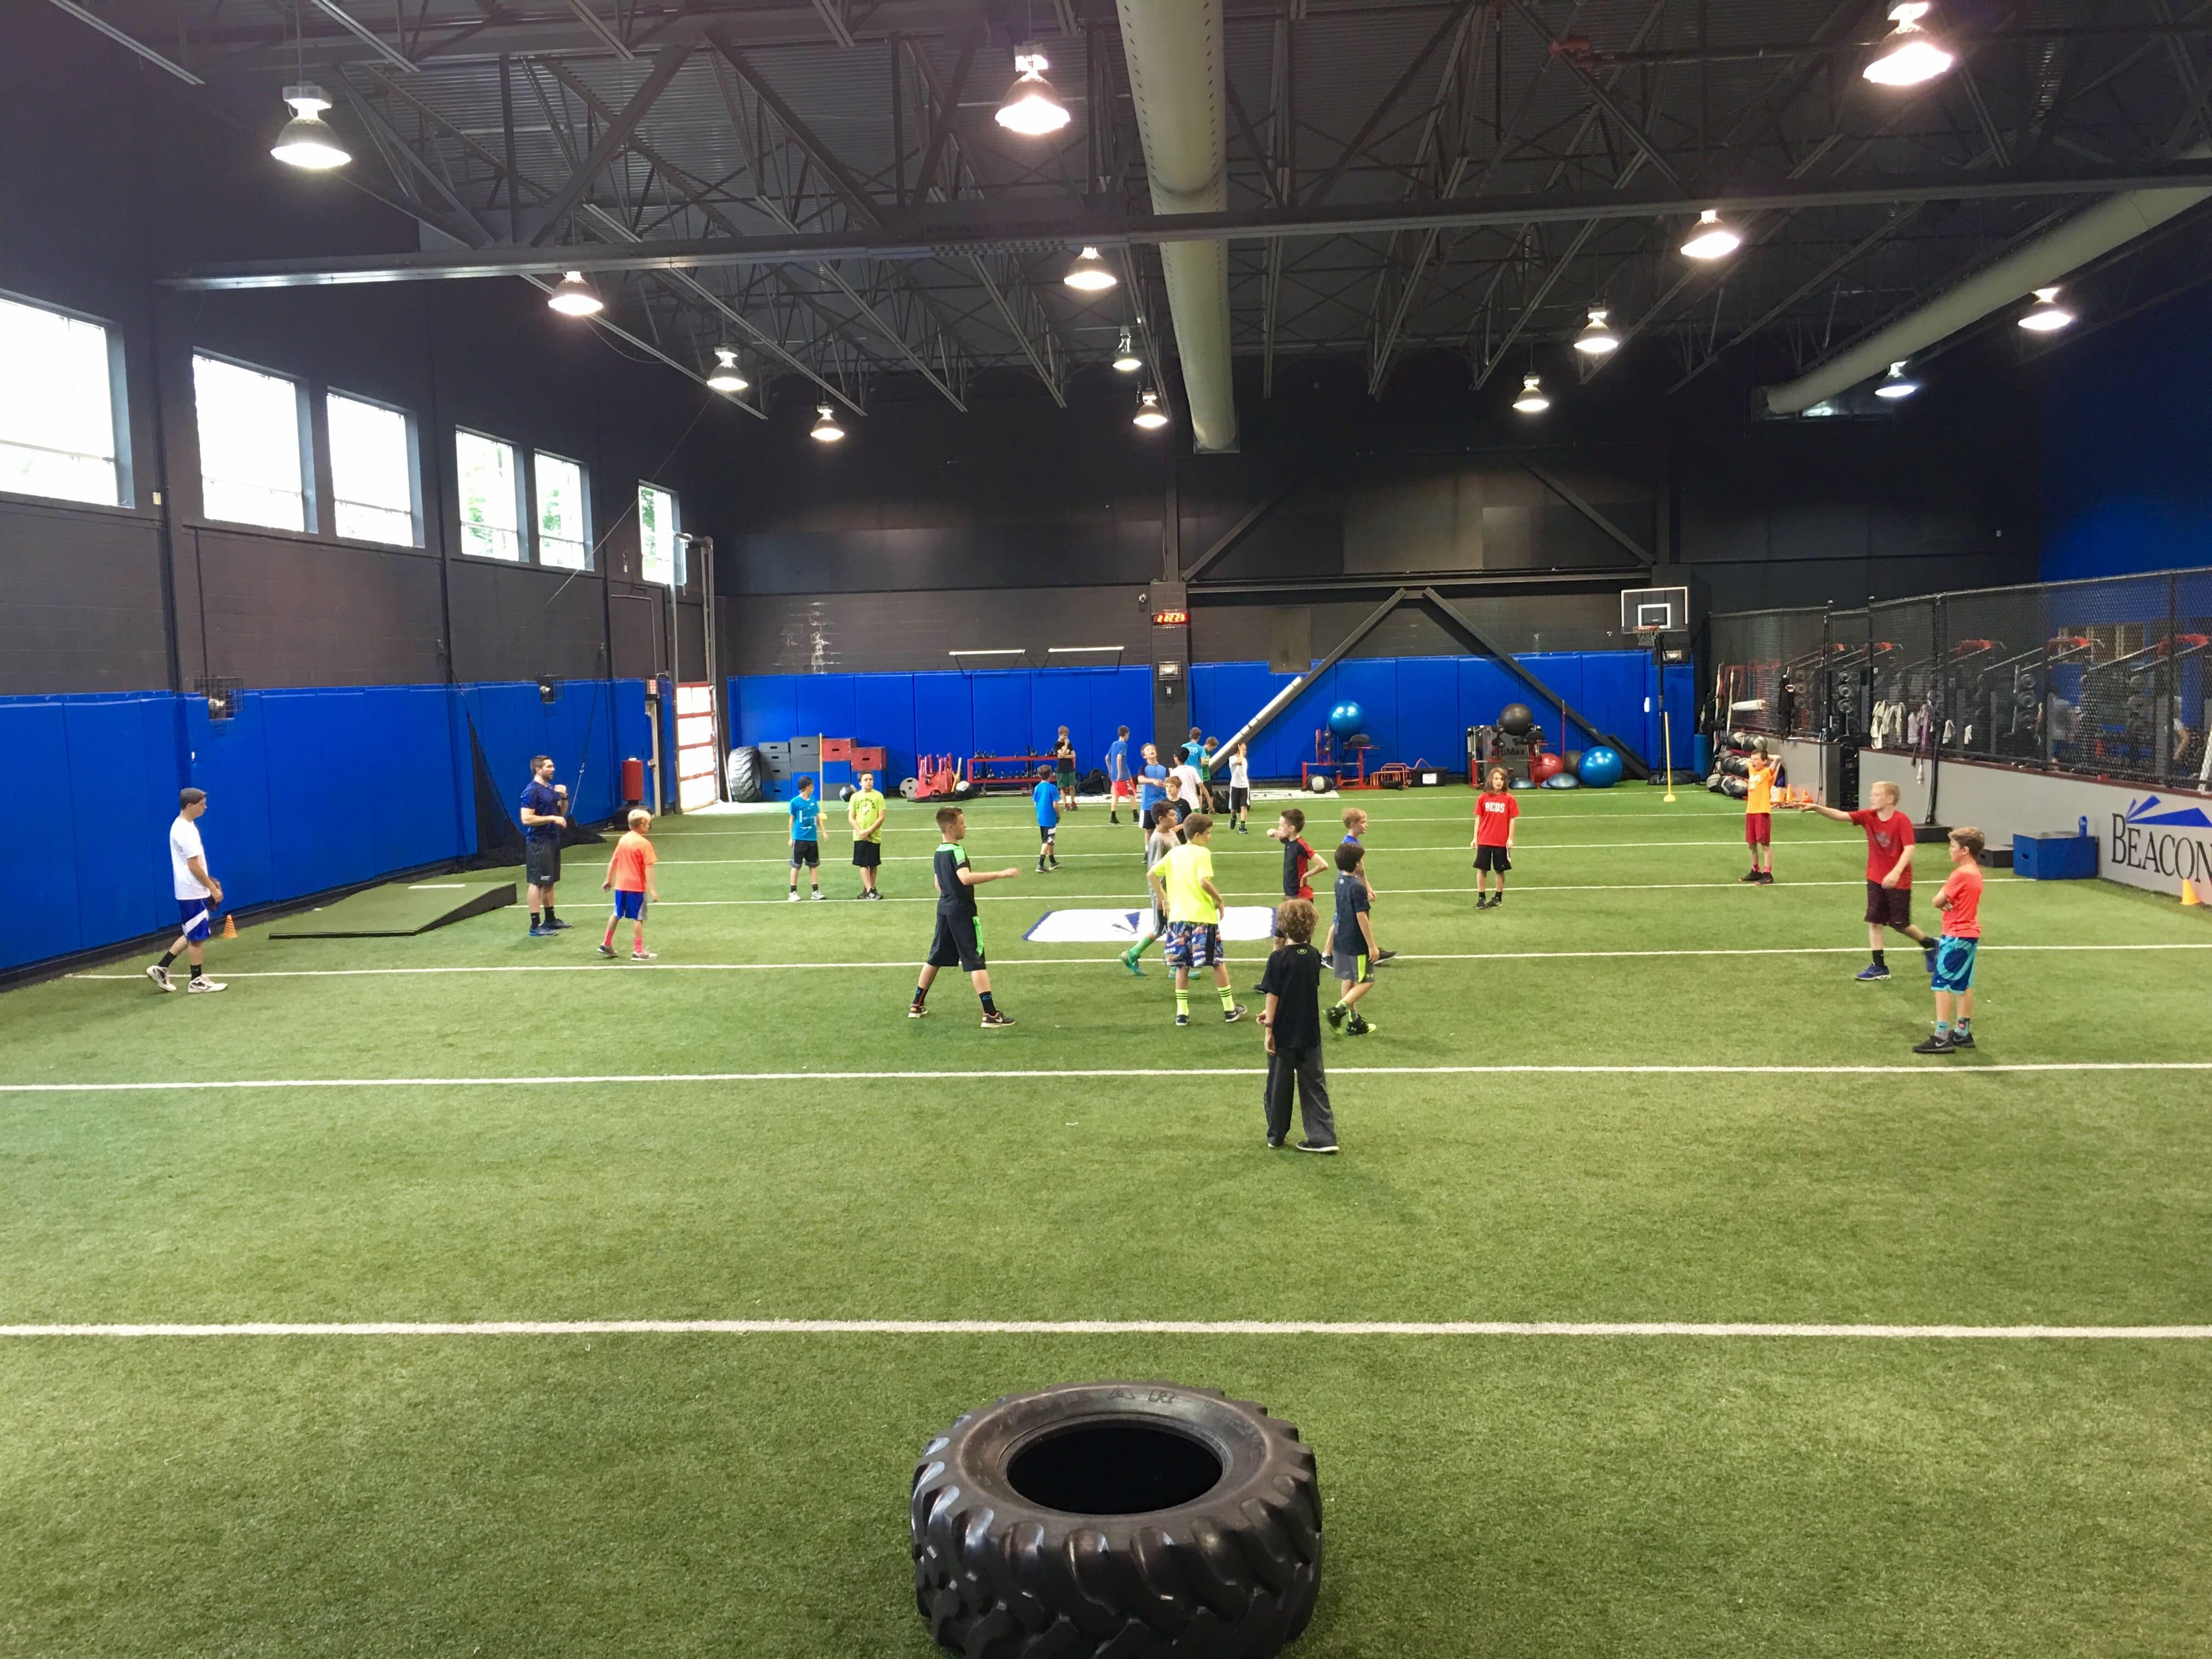 Indoor Turf at Beacon Elite Sports Training